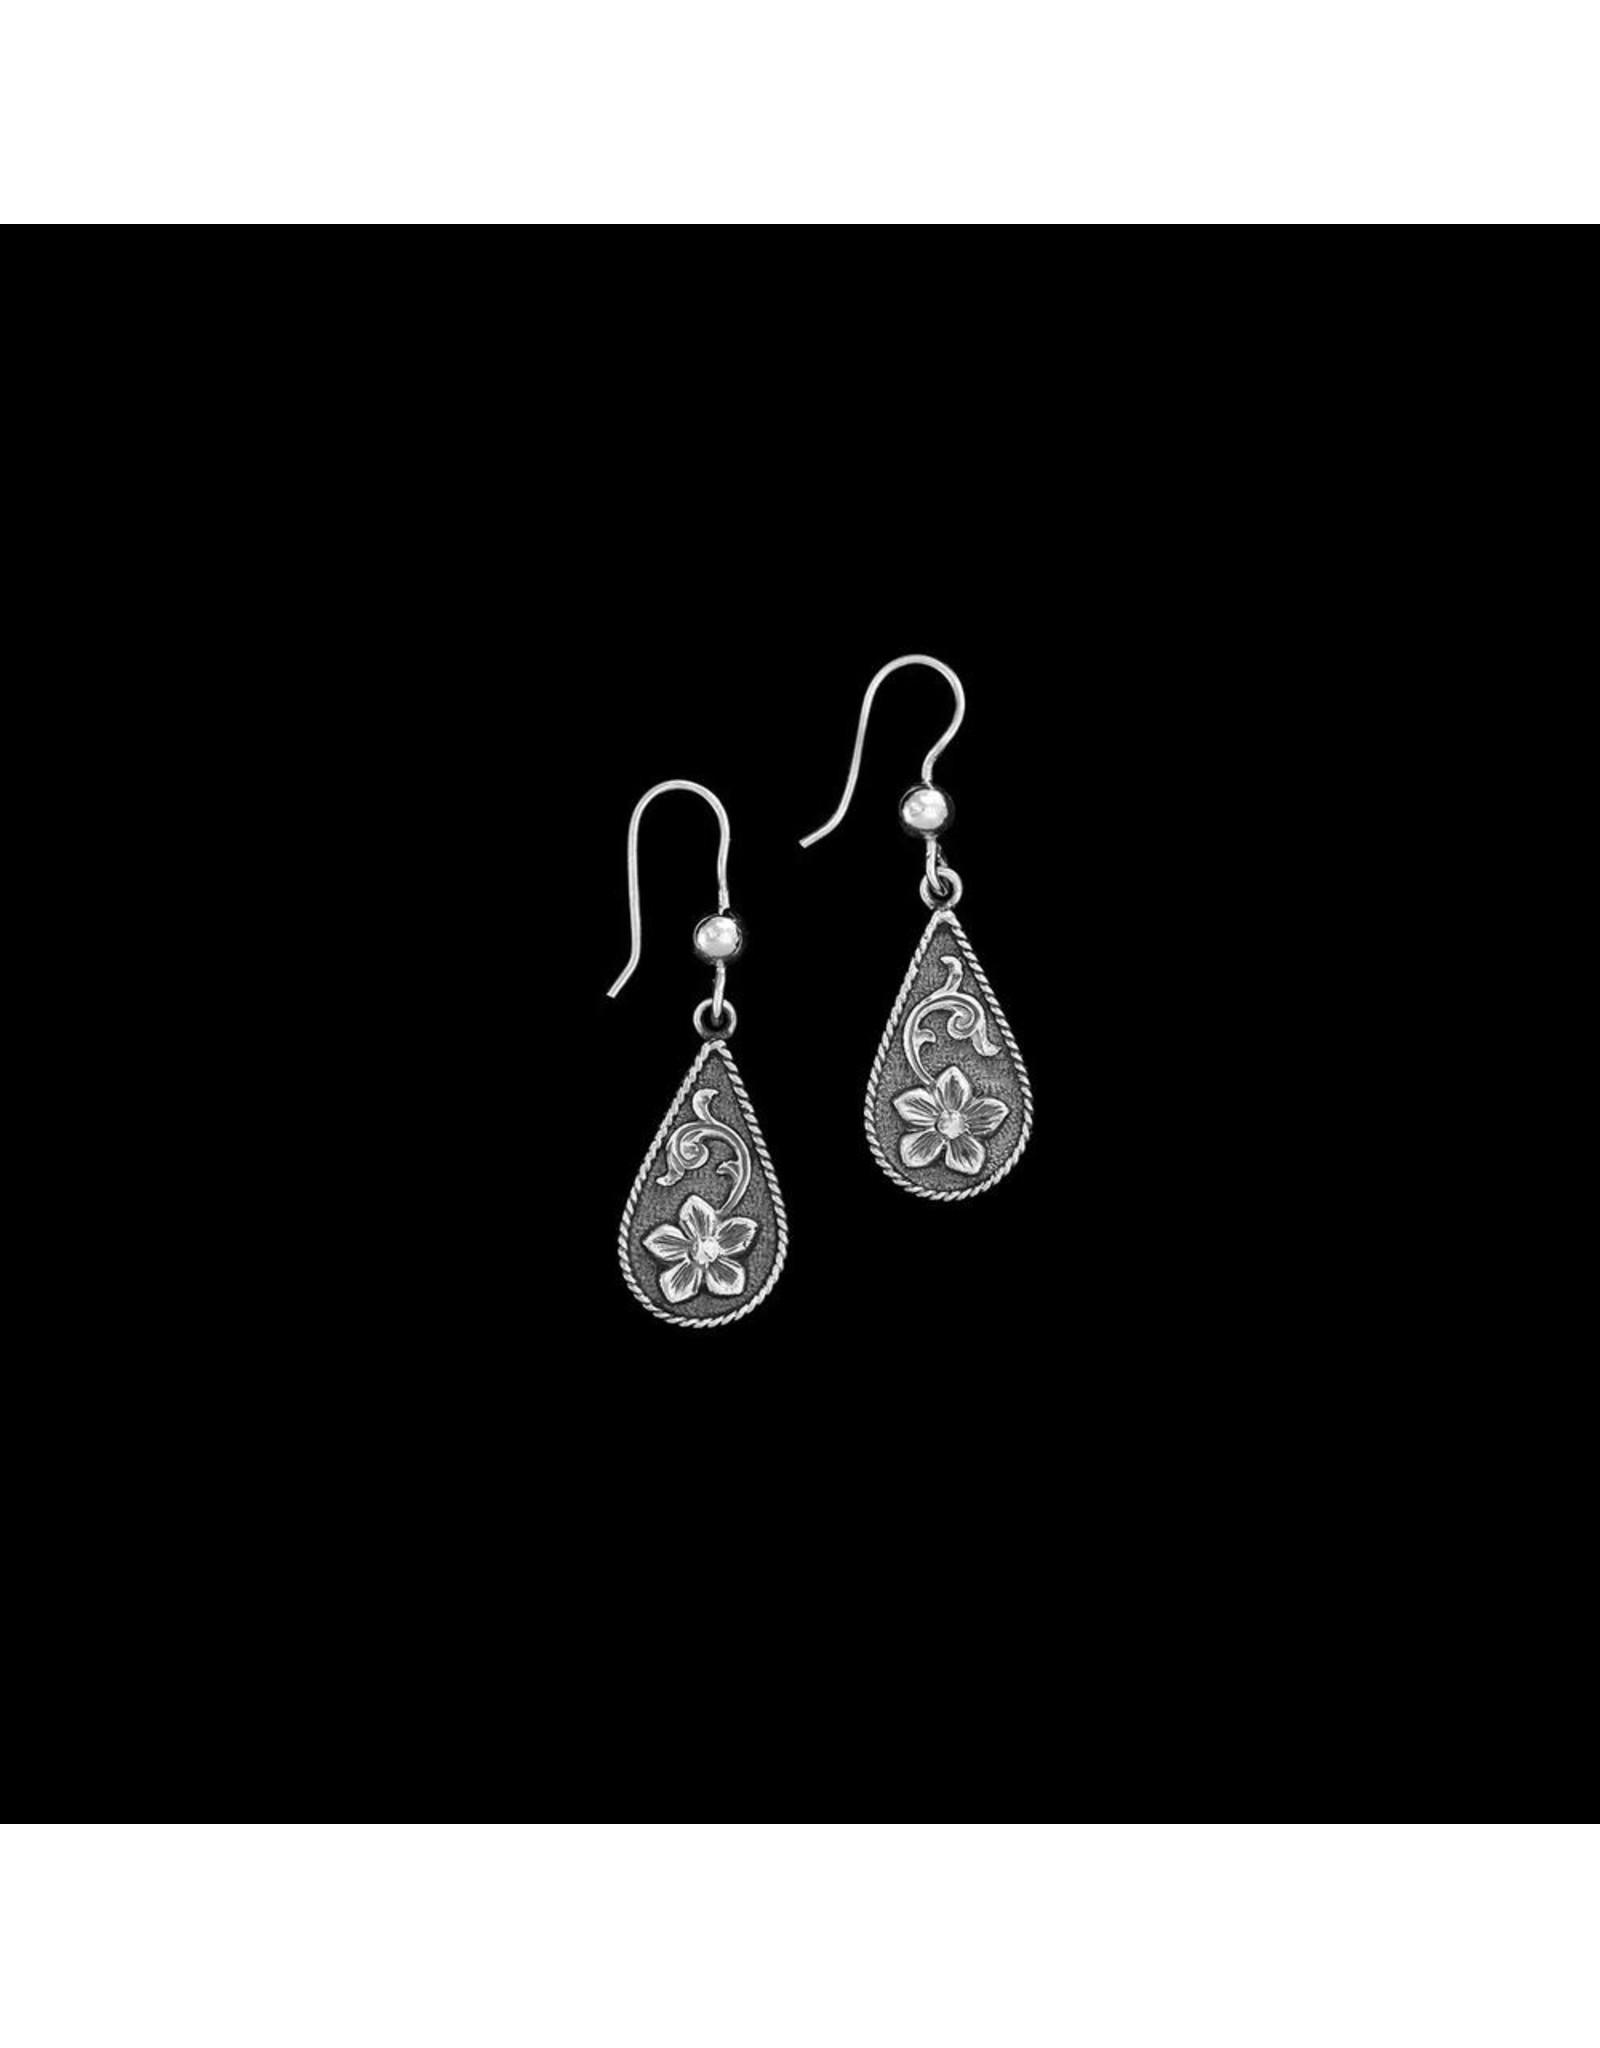 The Floralita Drops Earrings